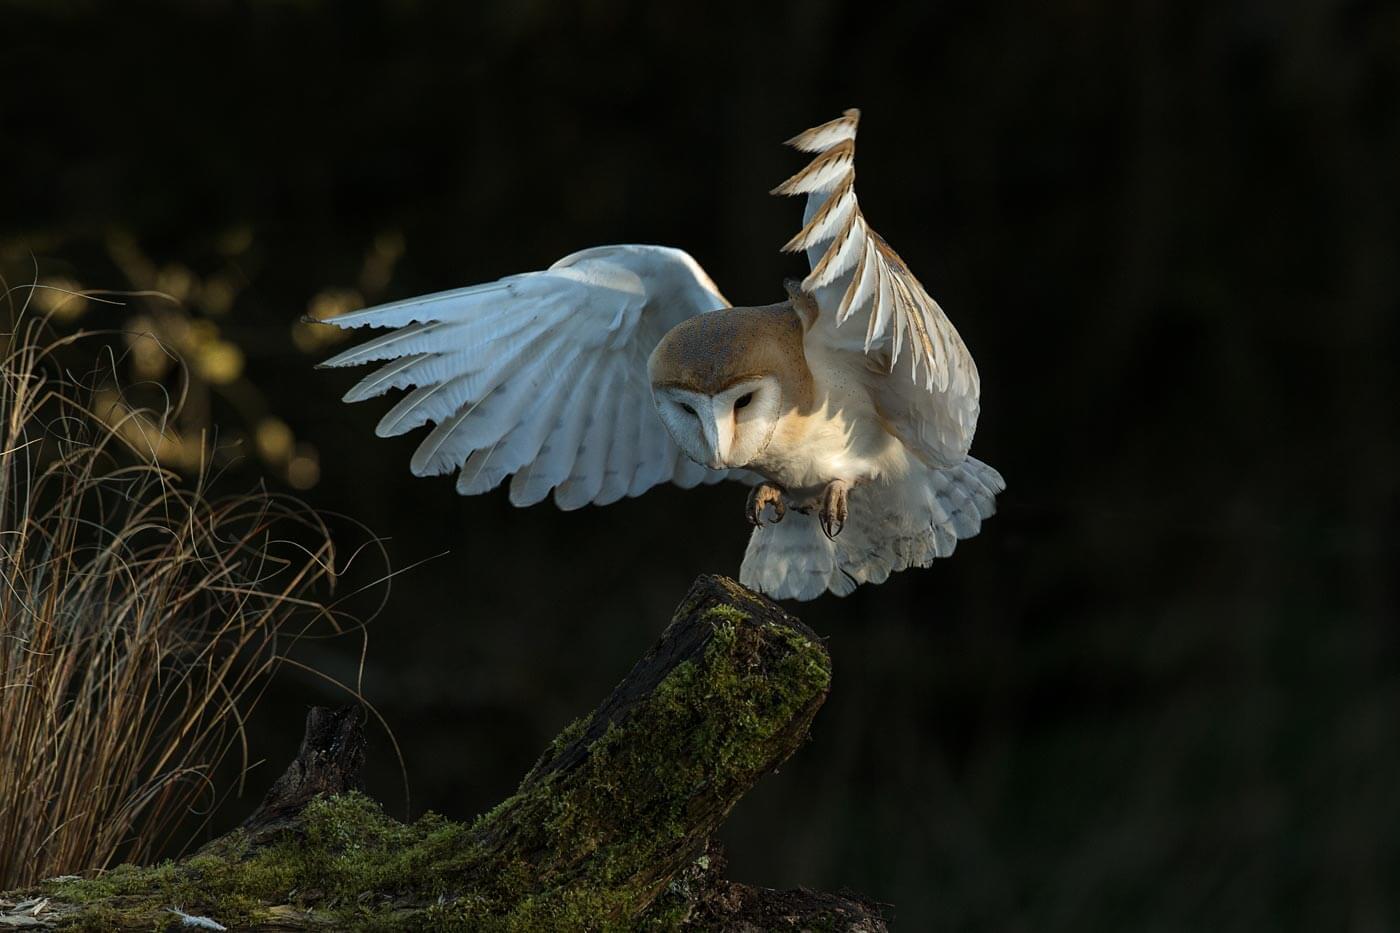 Barn Owl landing on tree stump